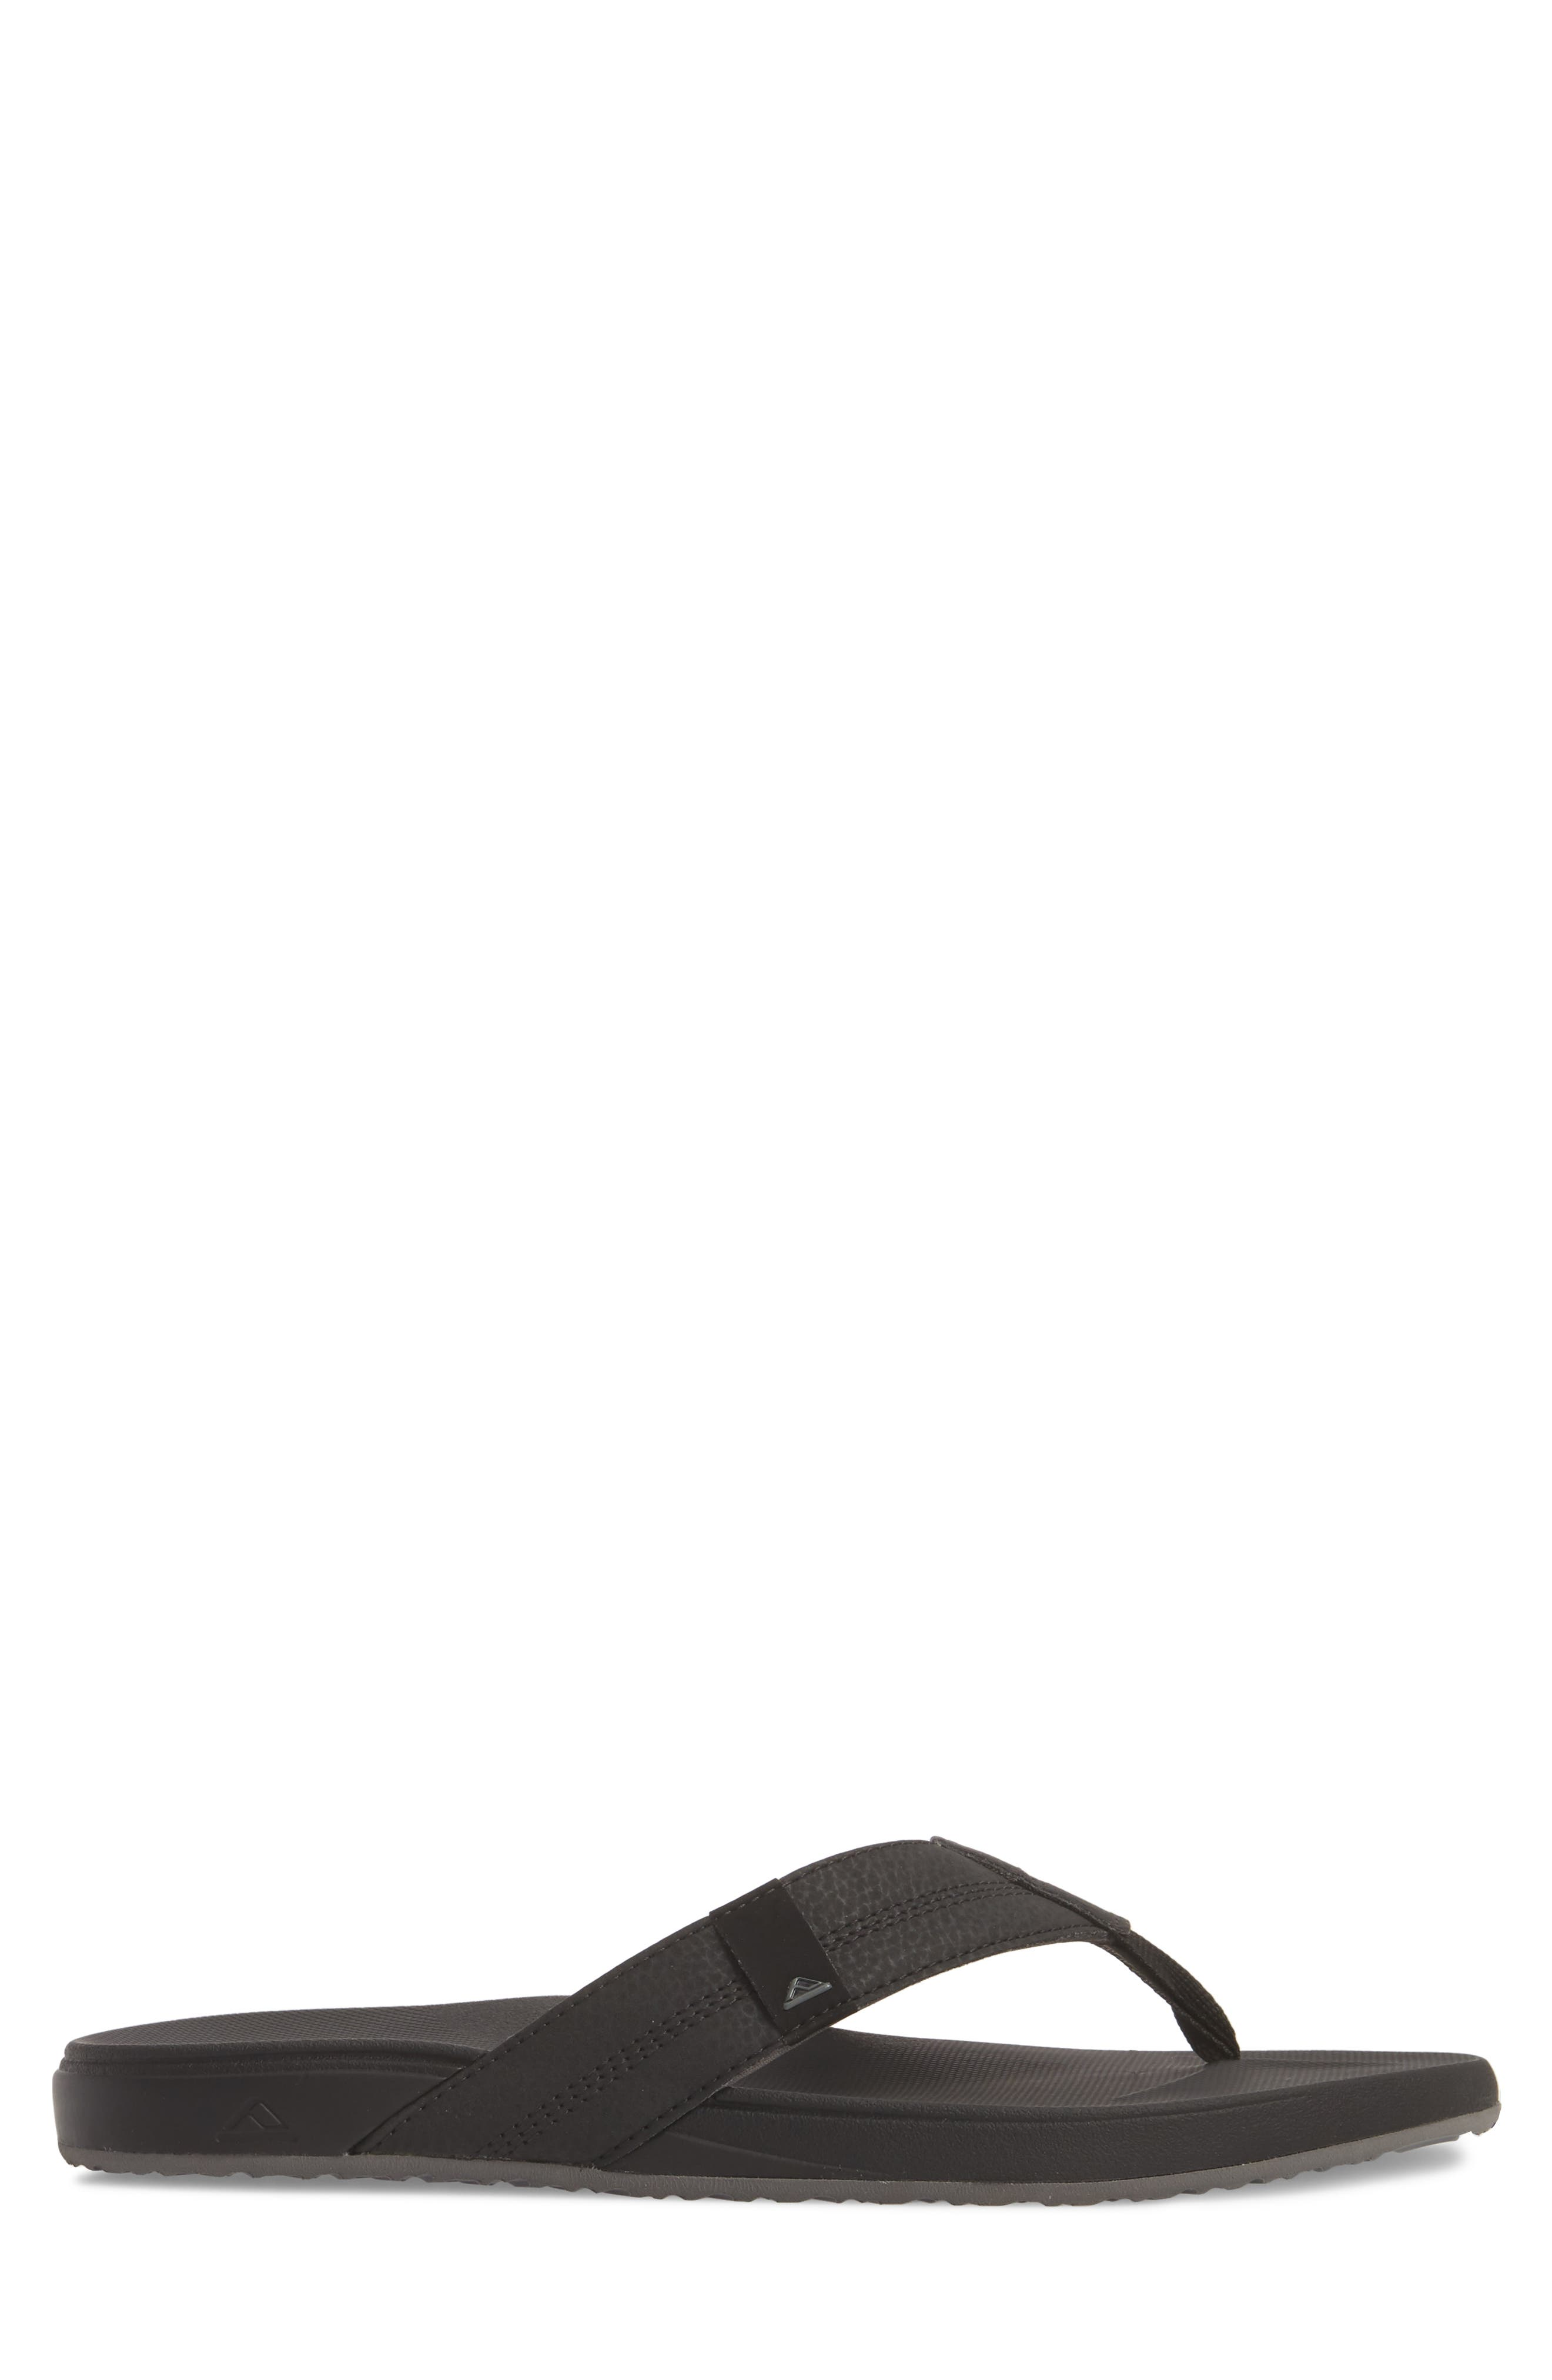 REEF, Cushion Bounce Phantom Flip Flop, Alternate thumbnail 3, color, BLACK